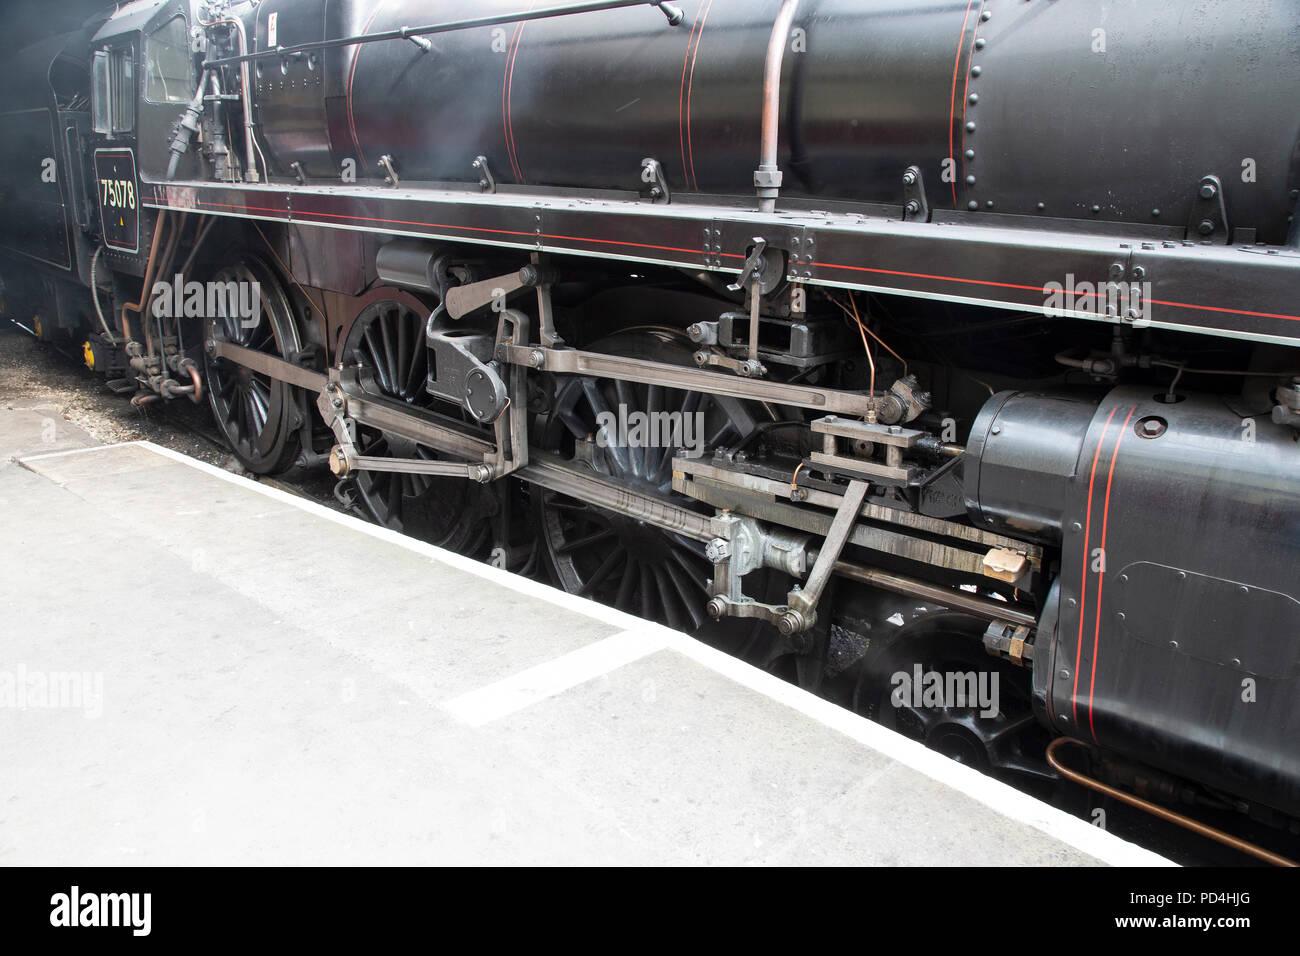 Walschaerts valve gear (piston valves) on 4MT Steam Locomotive 75078 - Stock Image